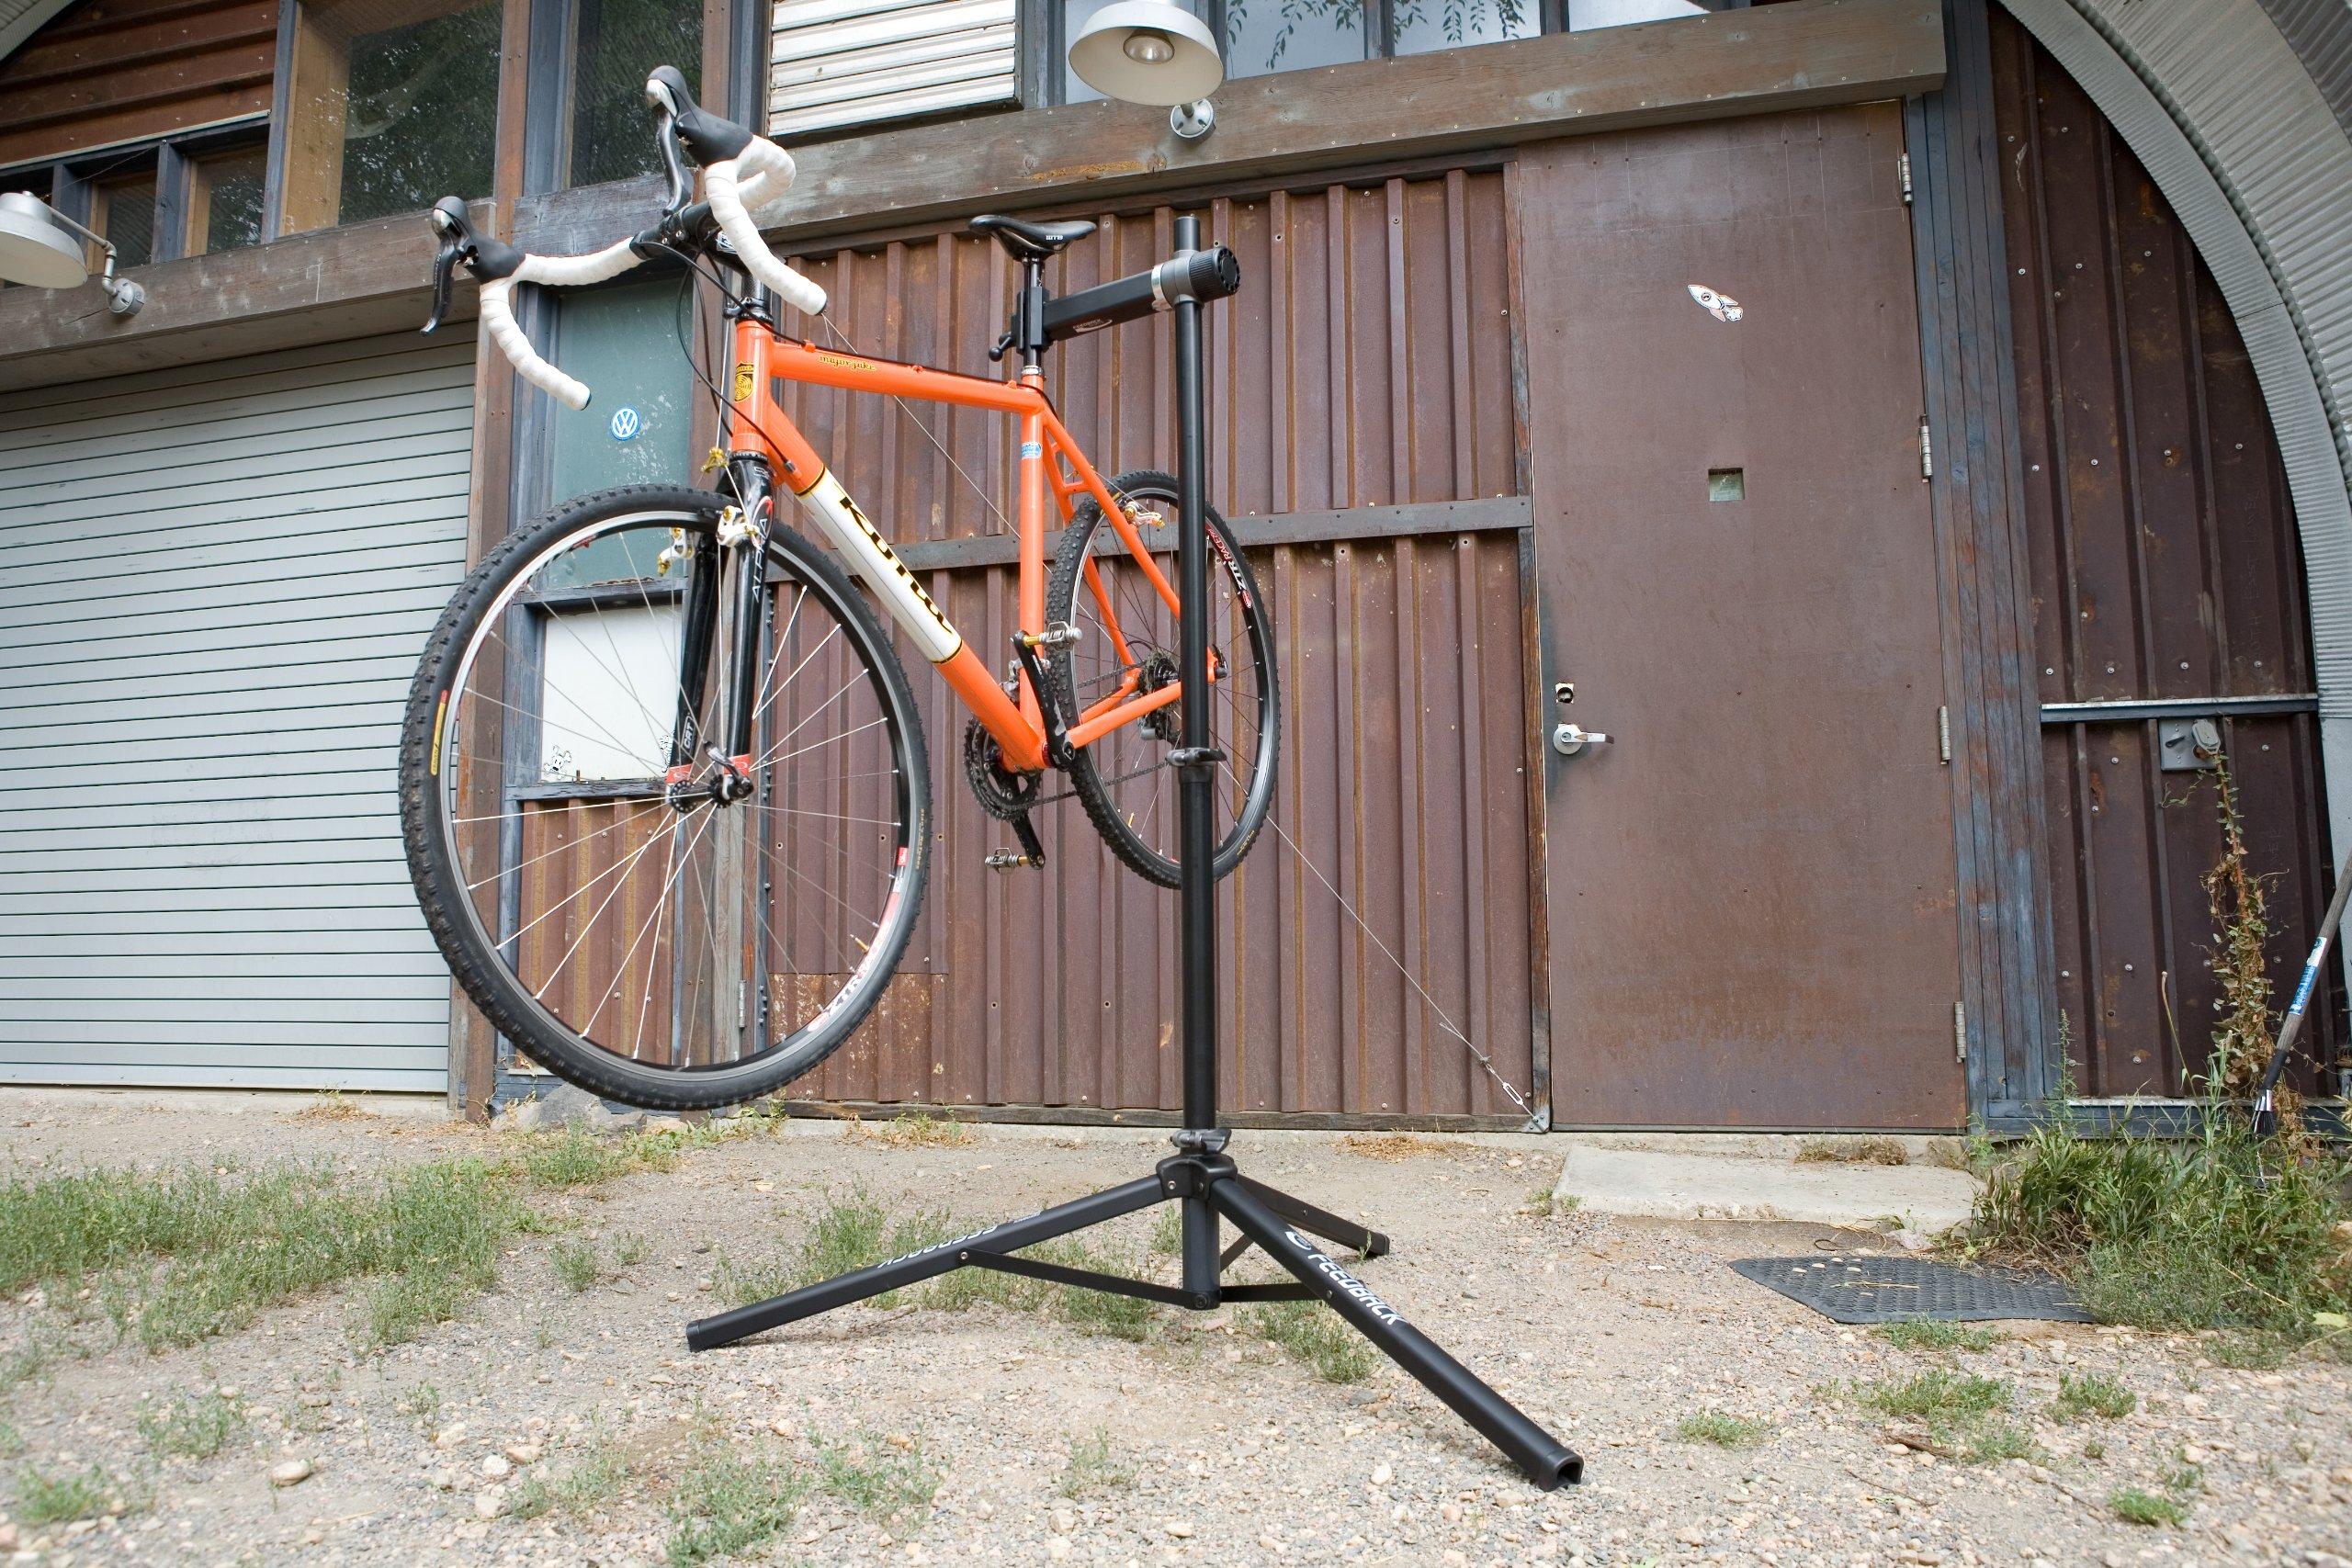 Feedback Sports Sport-Mechanic Repair Stand (Black) by Feedback Sports